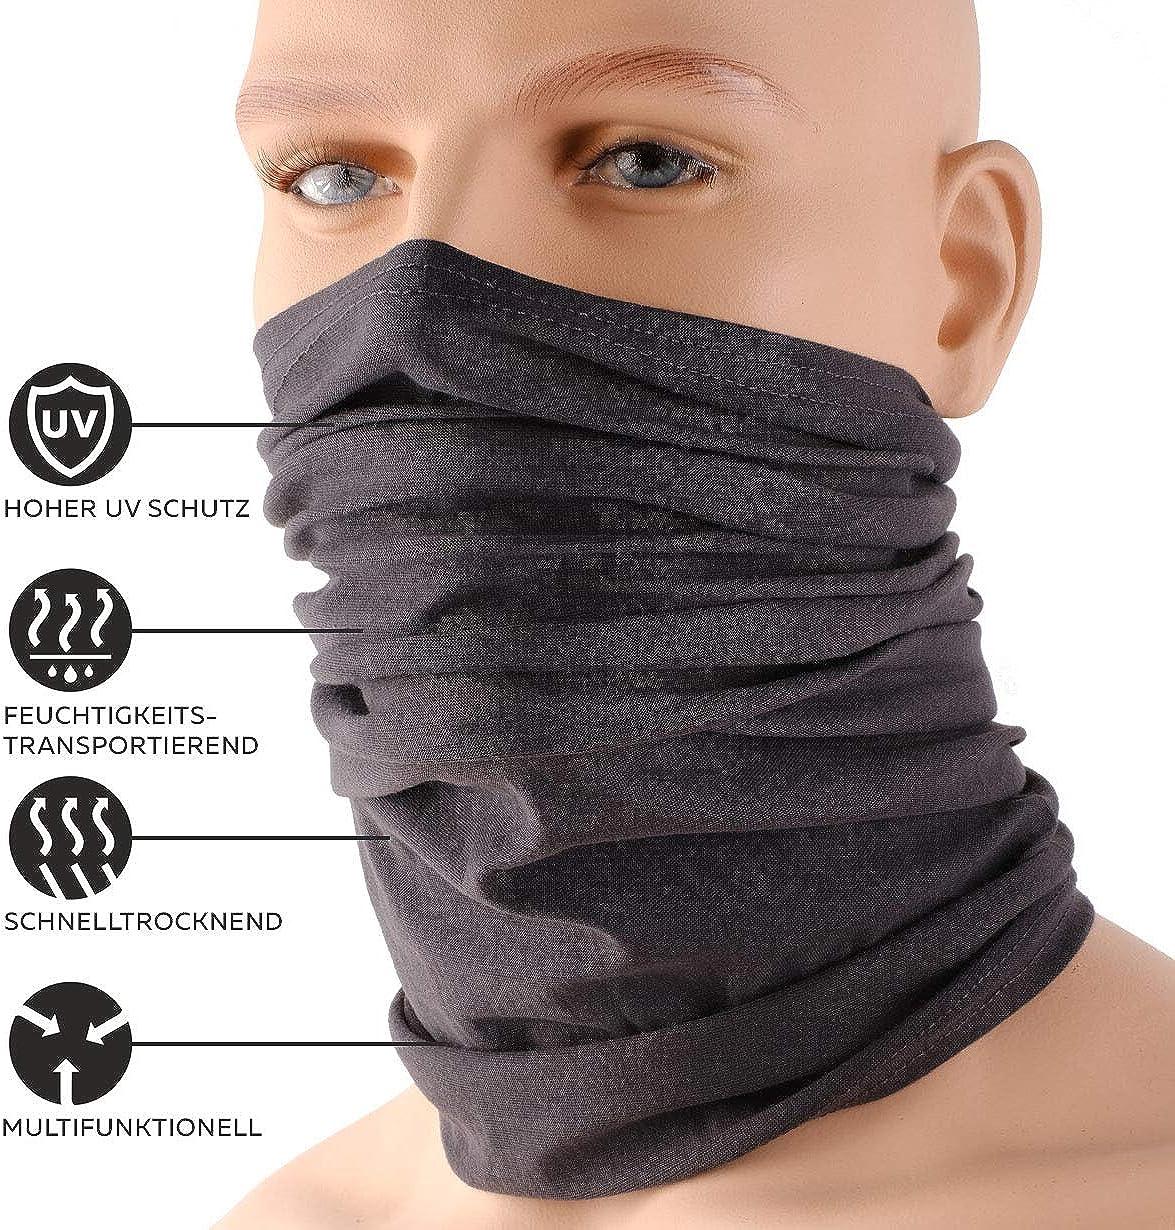 bandana//set of 3 in trendy designs HILLTOP 3 x motorcycle multifunctional scarf tubular scarf sports scarf